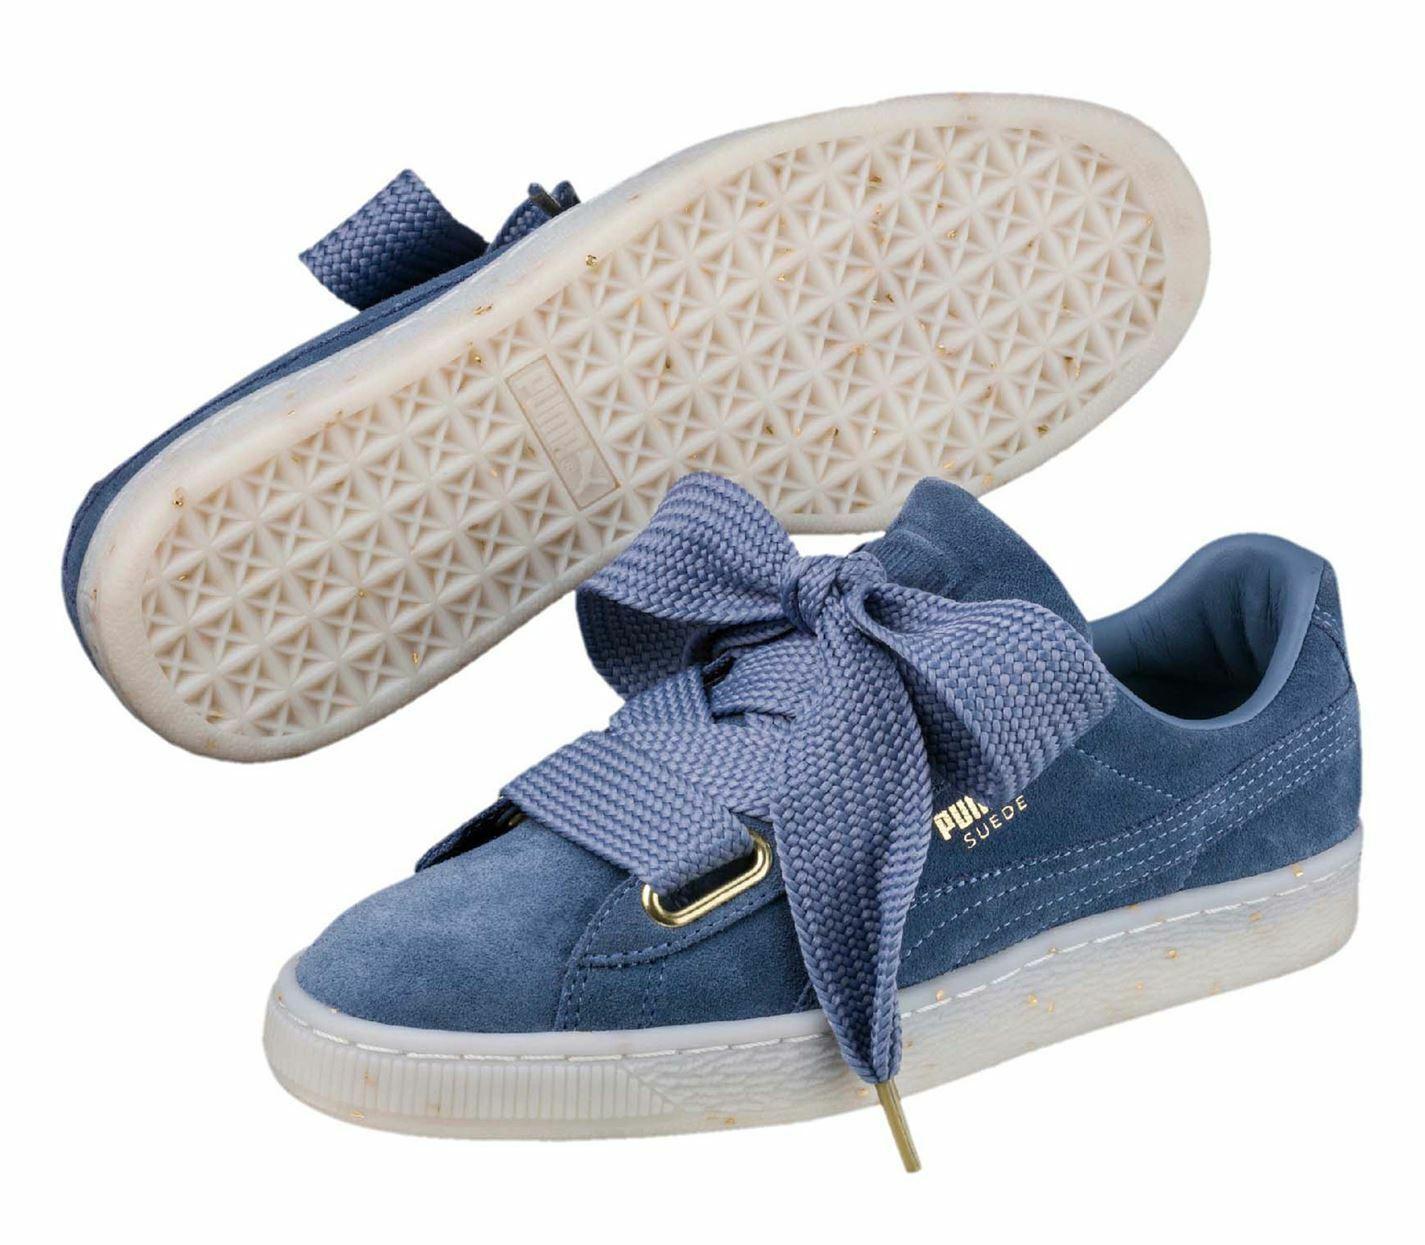 Zapatos de Mujer Gimnasia Puma ante Heart Entrenadores Azul de Piel Doble Cordón